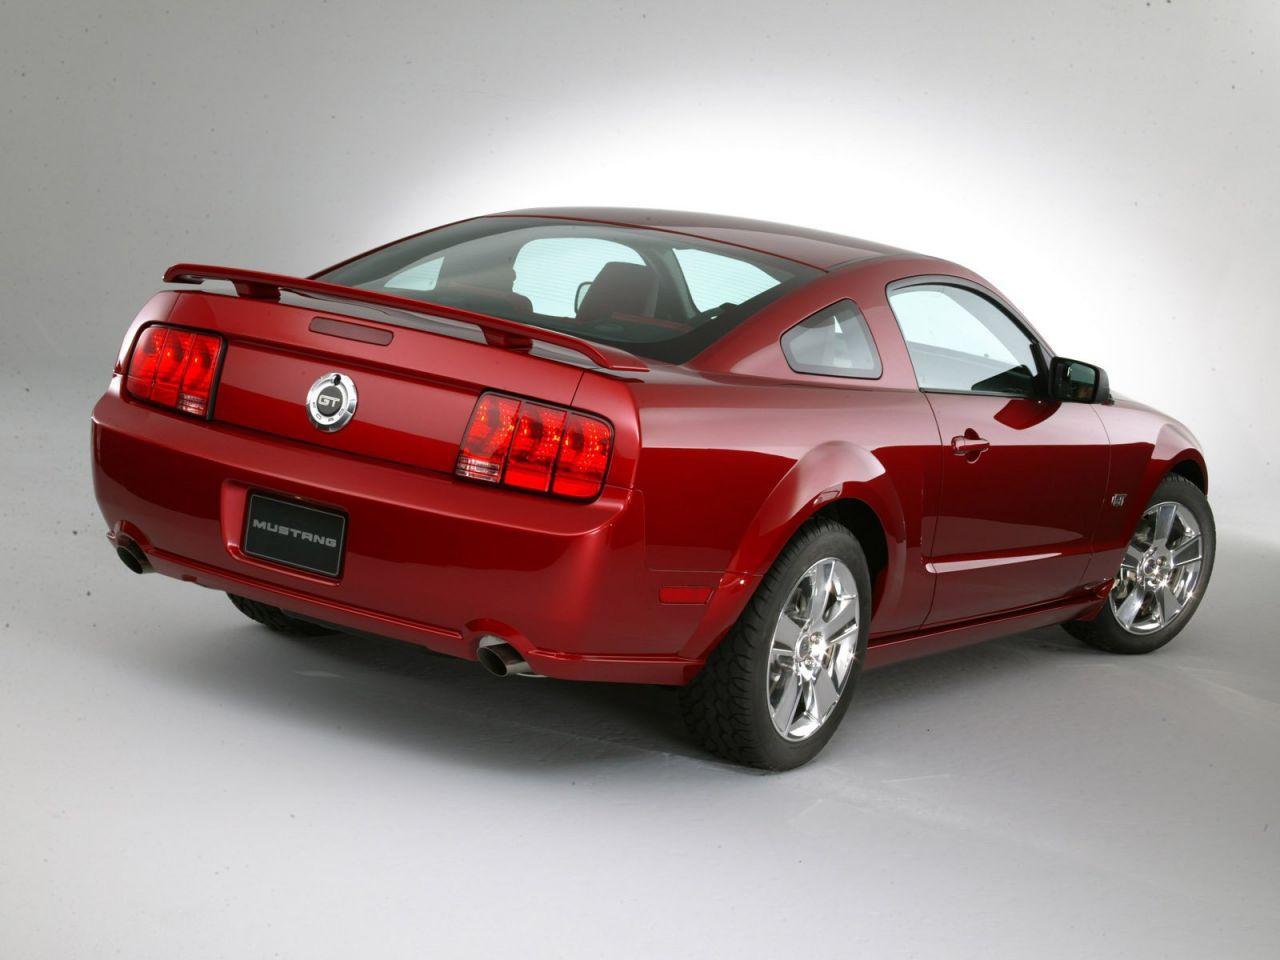 Ford_Mustang_2005.jpg